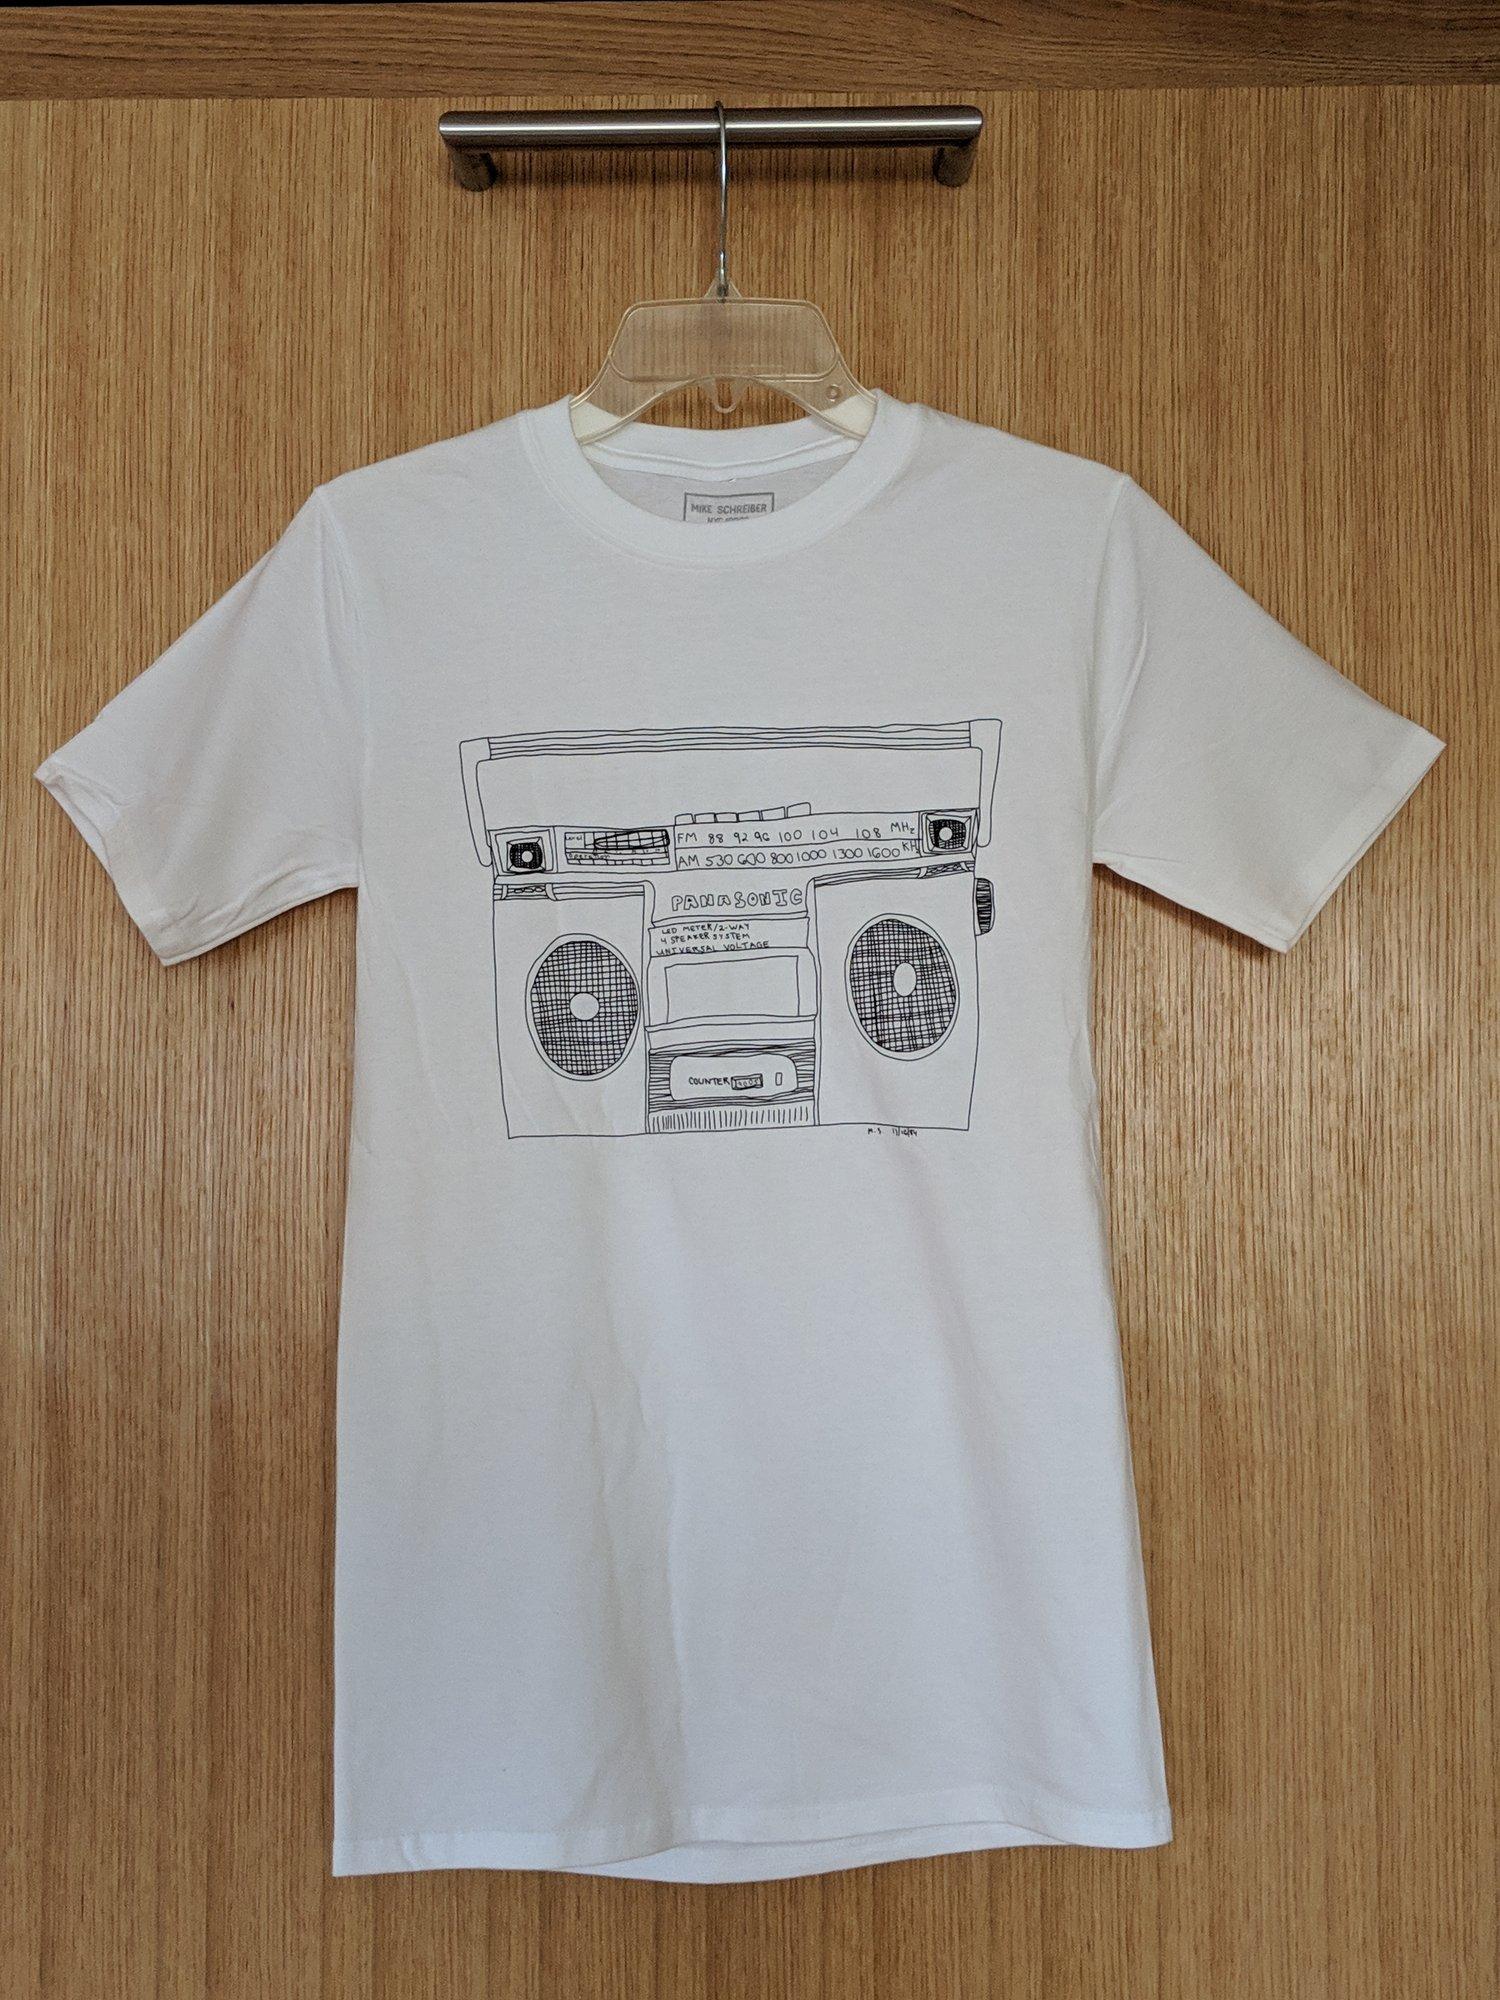 Image of boombox shirt WHT